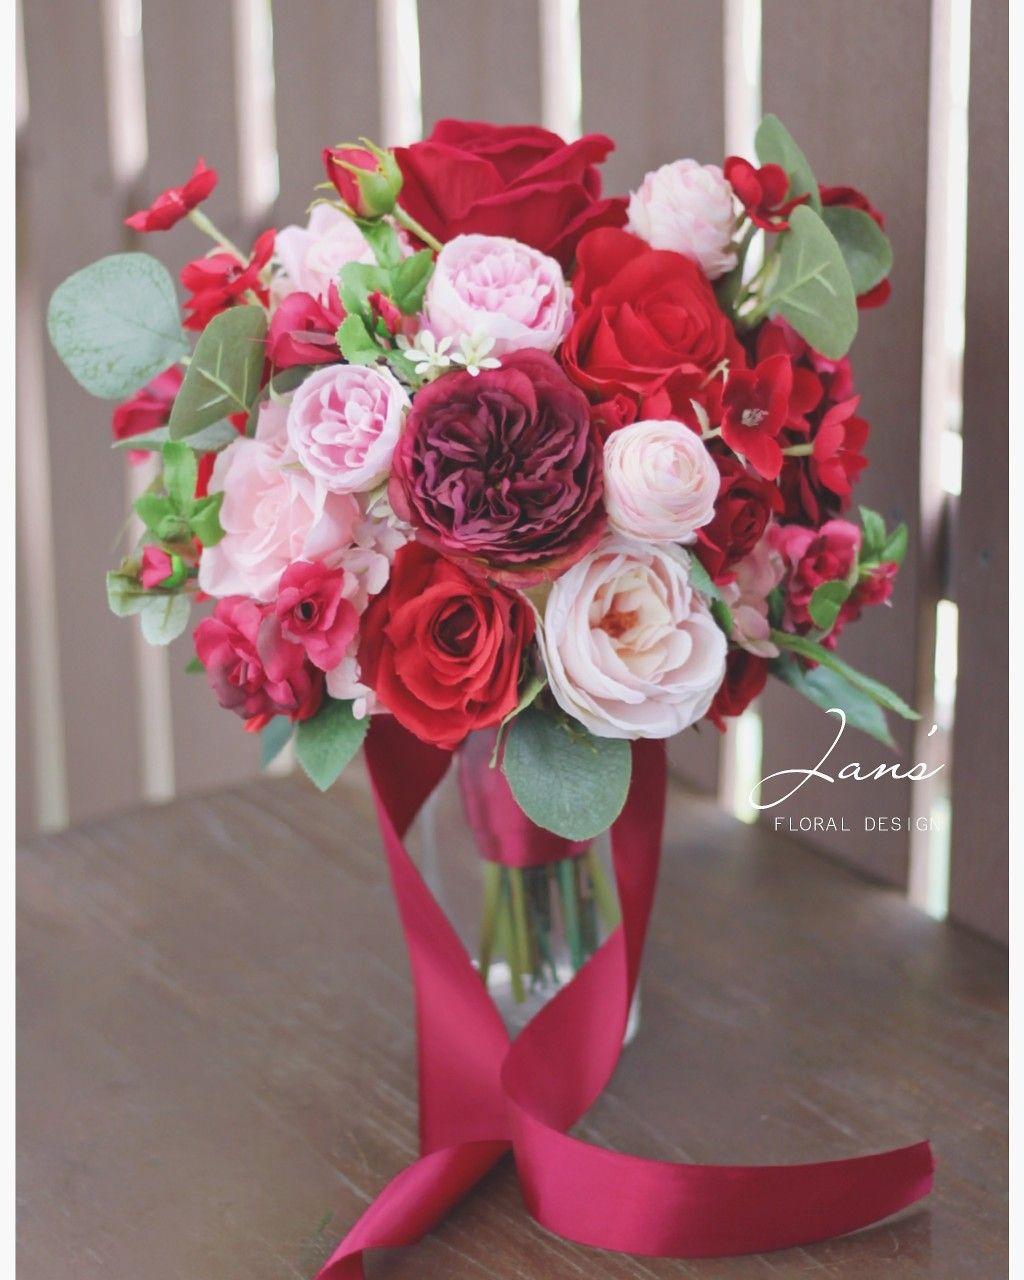 Wedding Bouquet Image By Jan